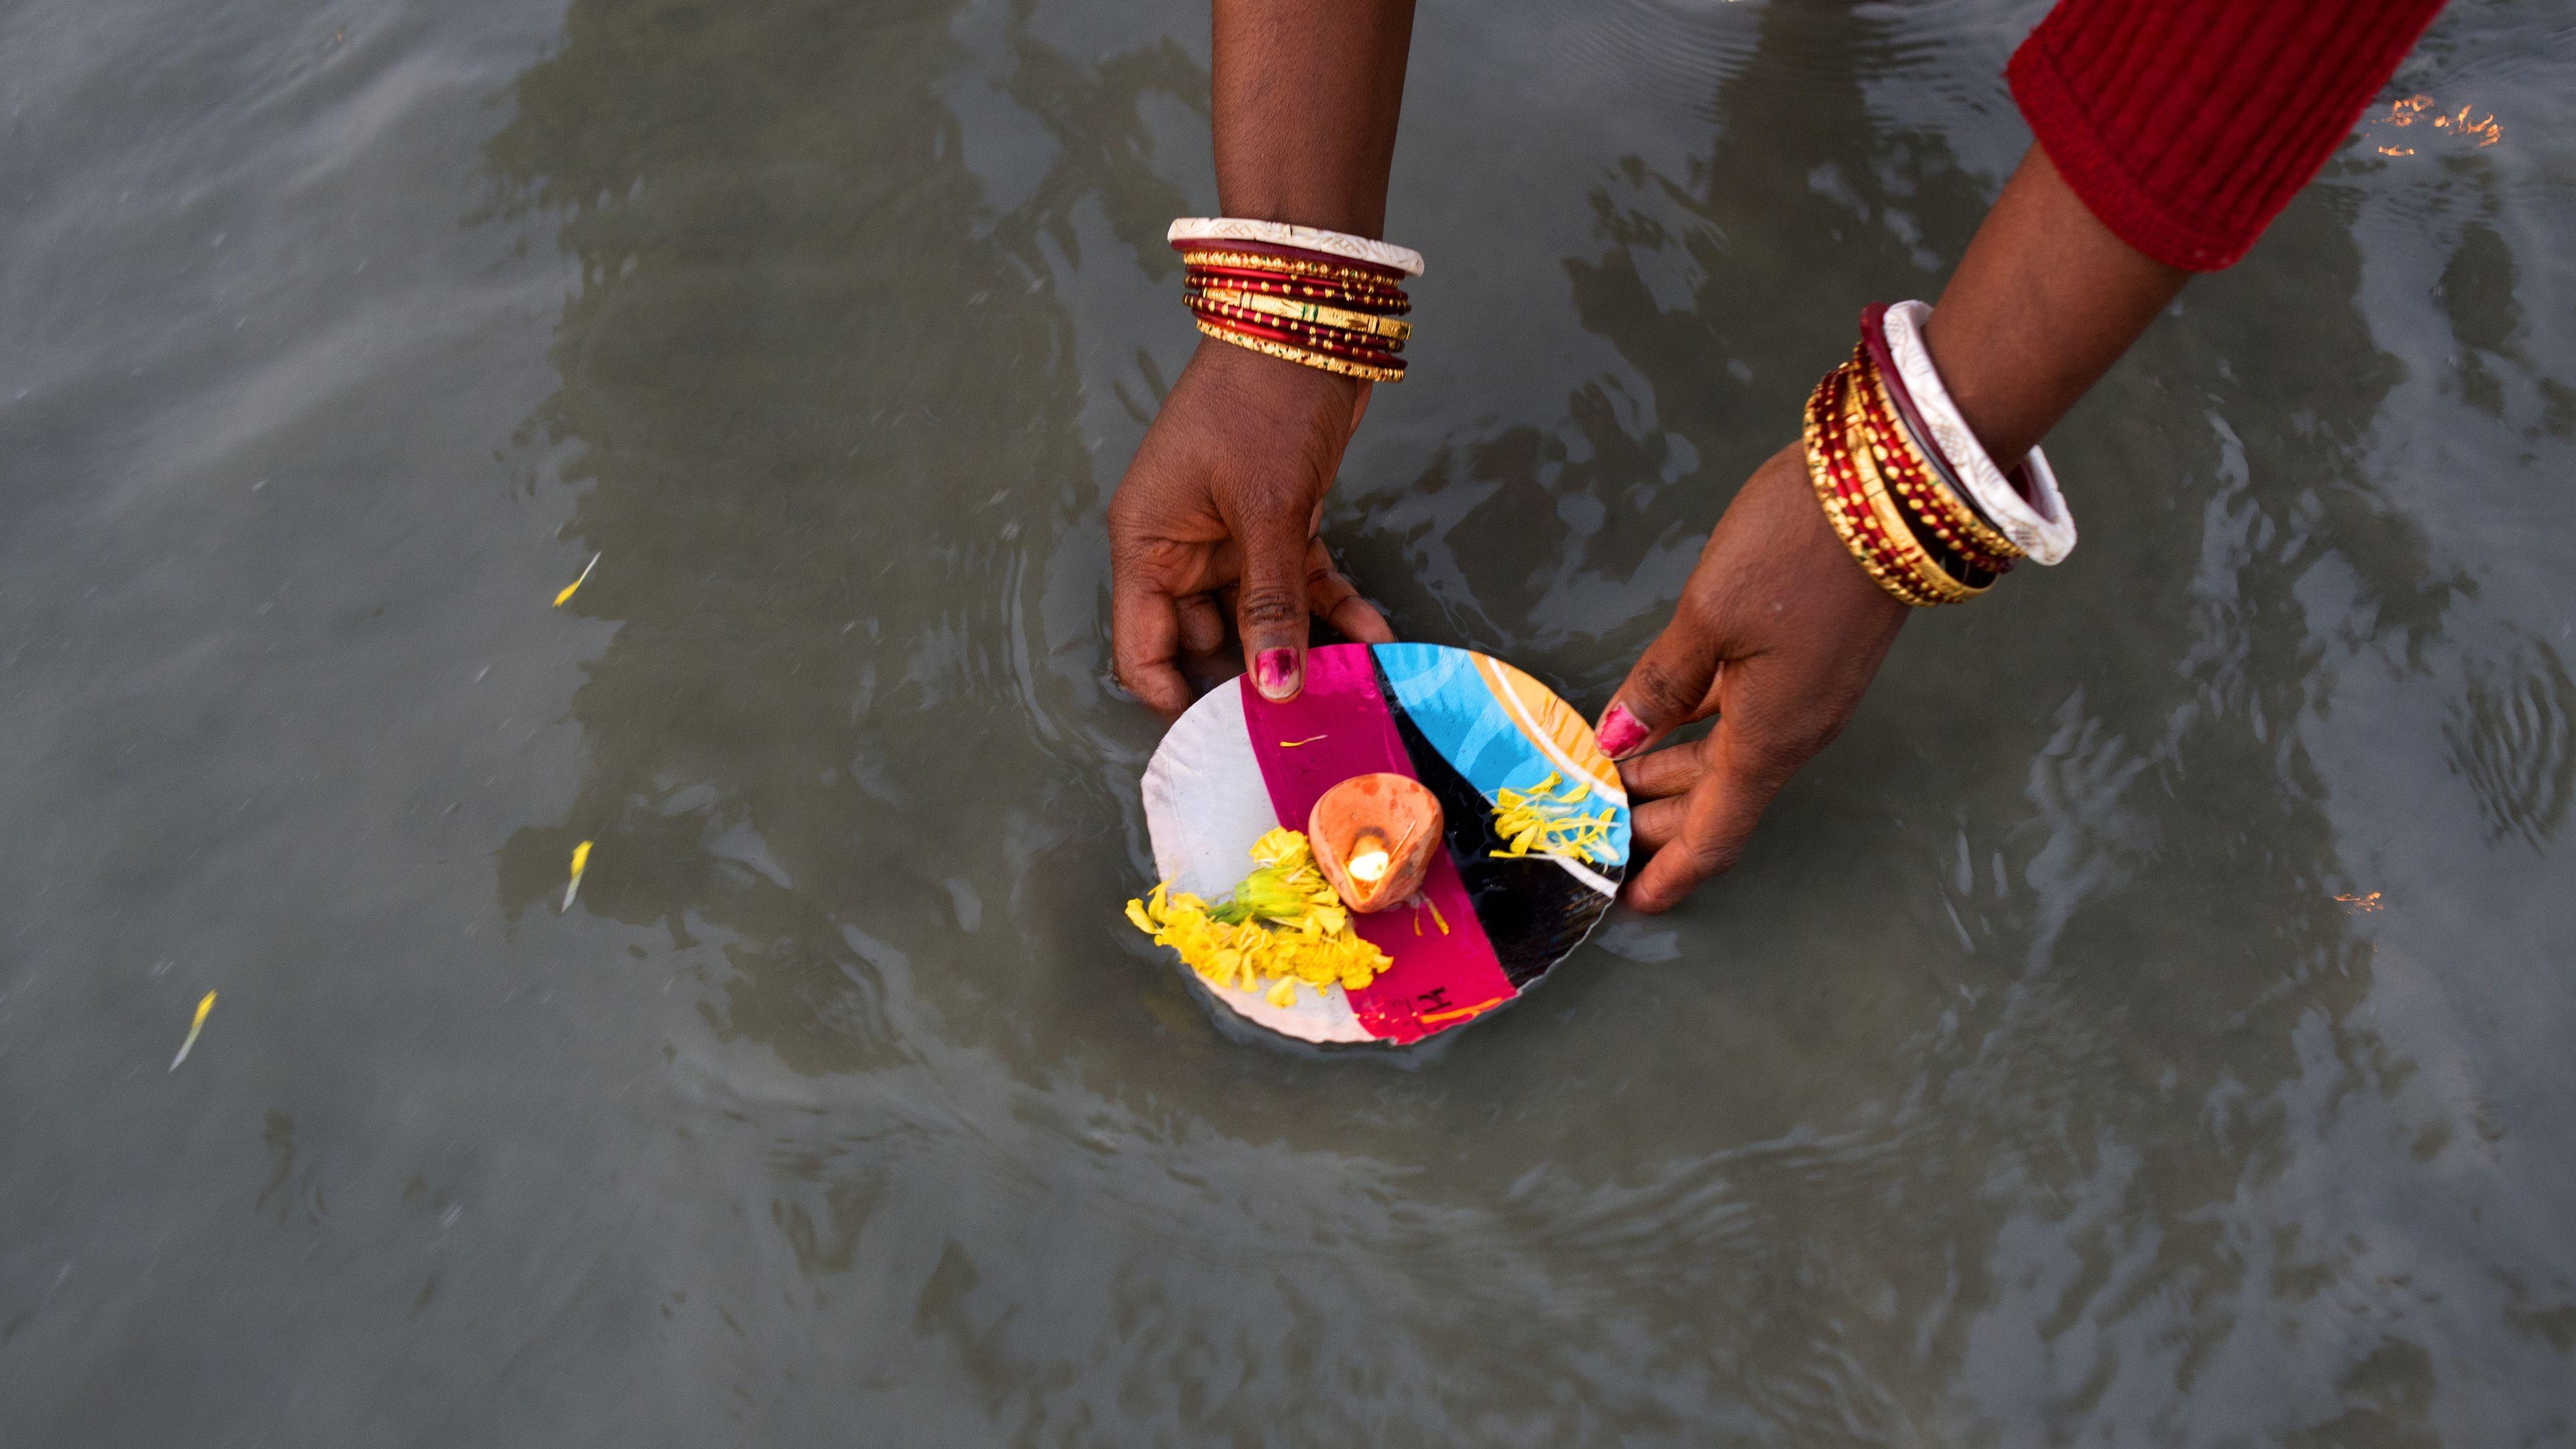 Nanakshahi Calendar March 2019 Más Recientes Hindu Calendar Days Months Years and Epochs Of Nanakshahi Calendar March 2019 Más Recientes School Year Calendars School Year Calendars